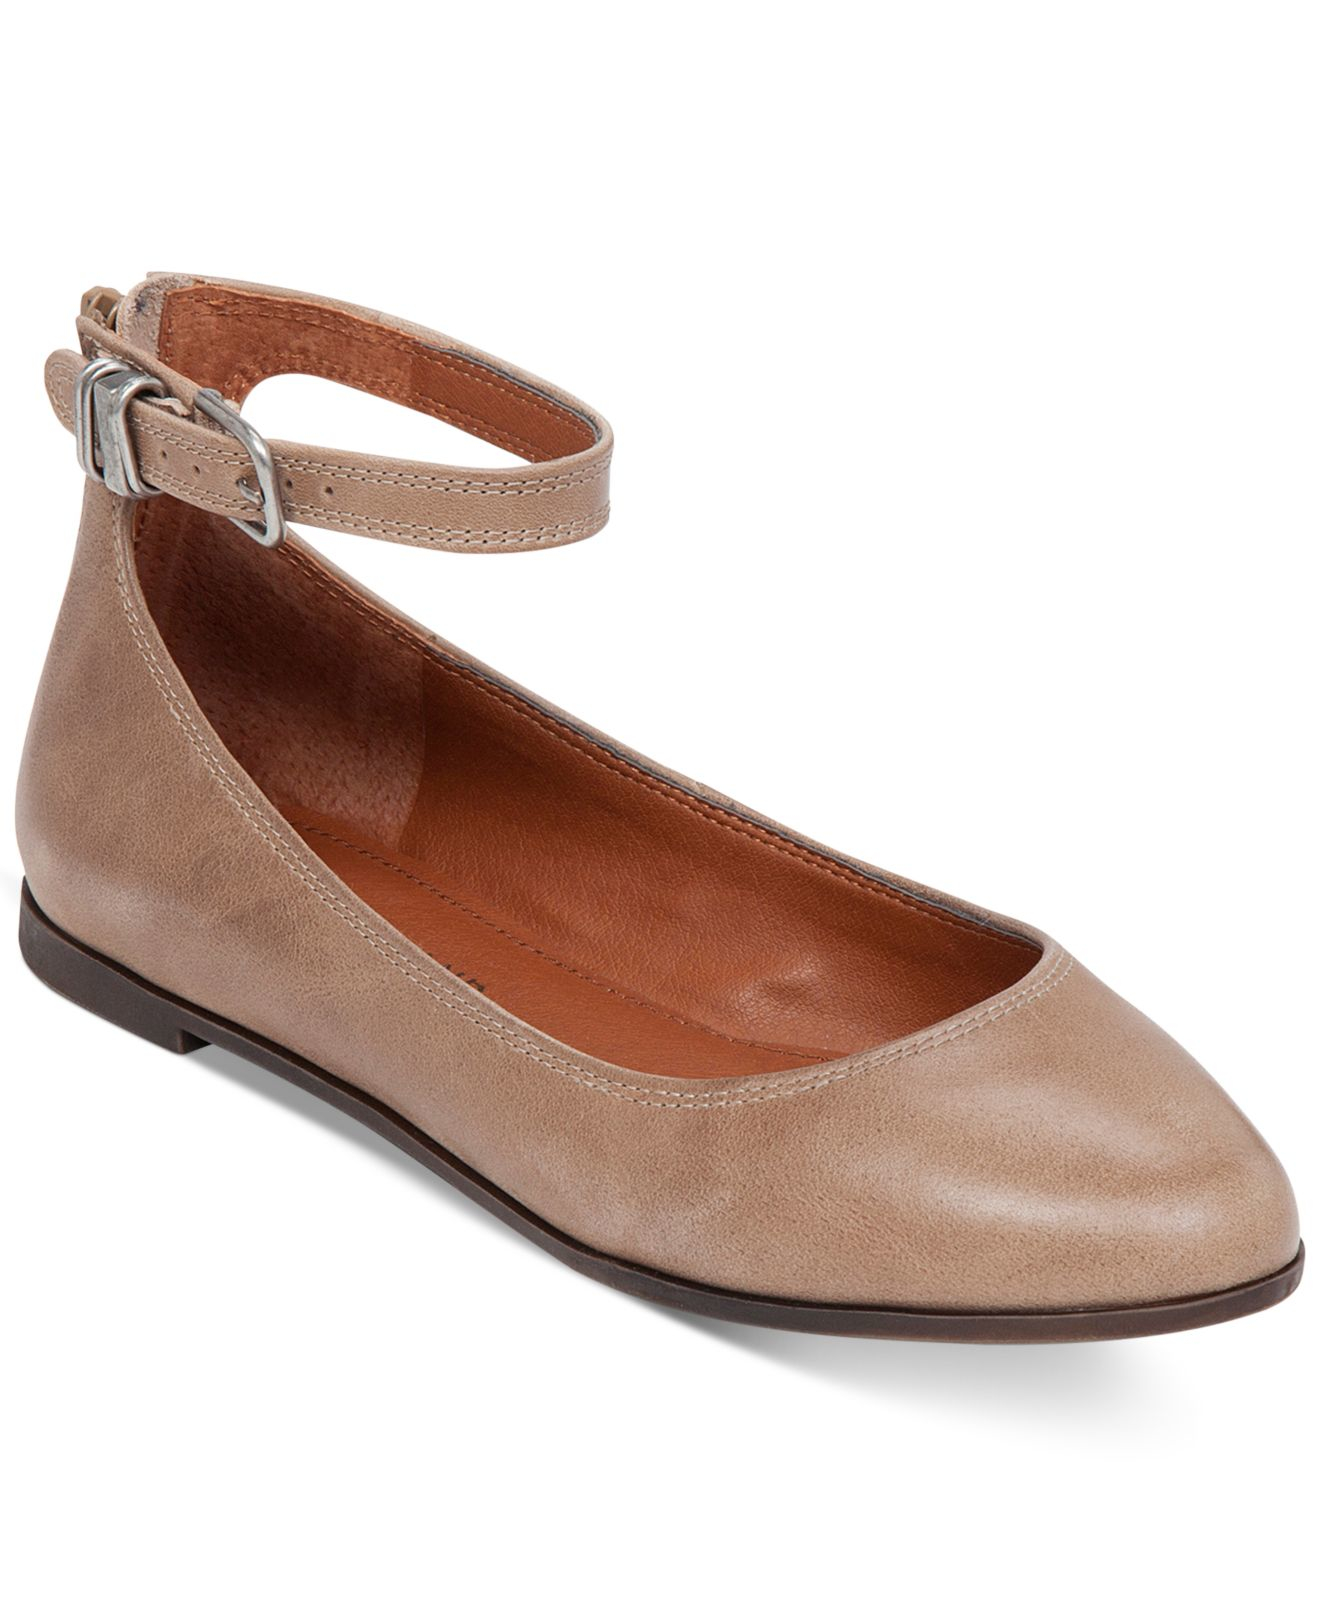 bc0857f50 Lyst - J.Crew Velvet Ankle-strap Ballet Flats in Pink